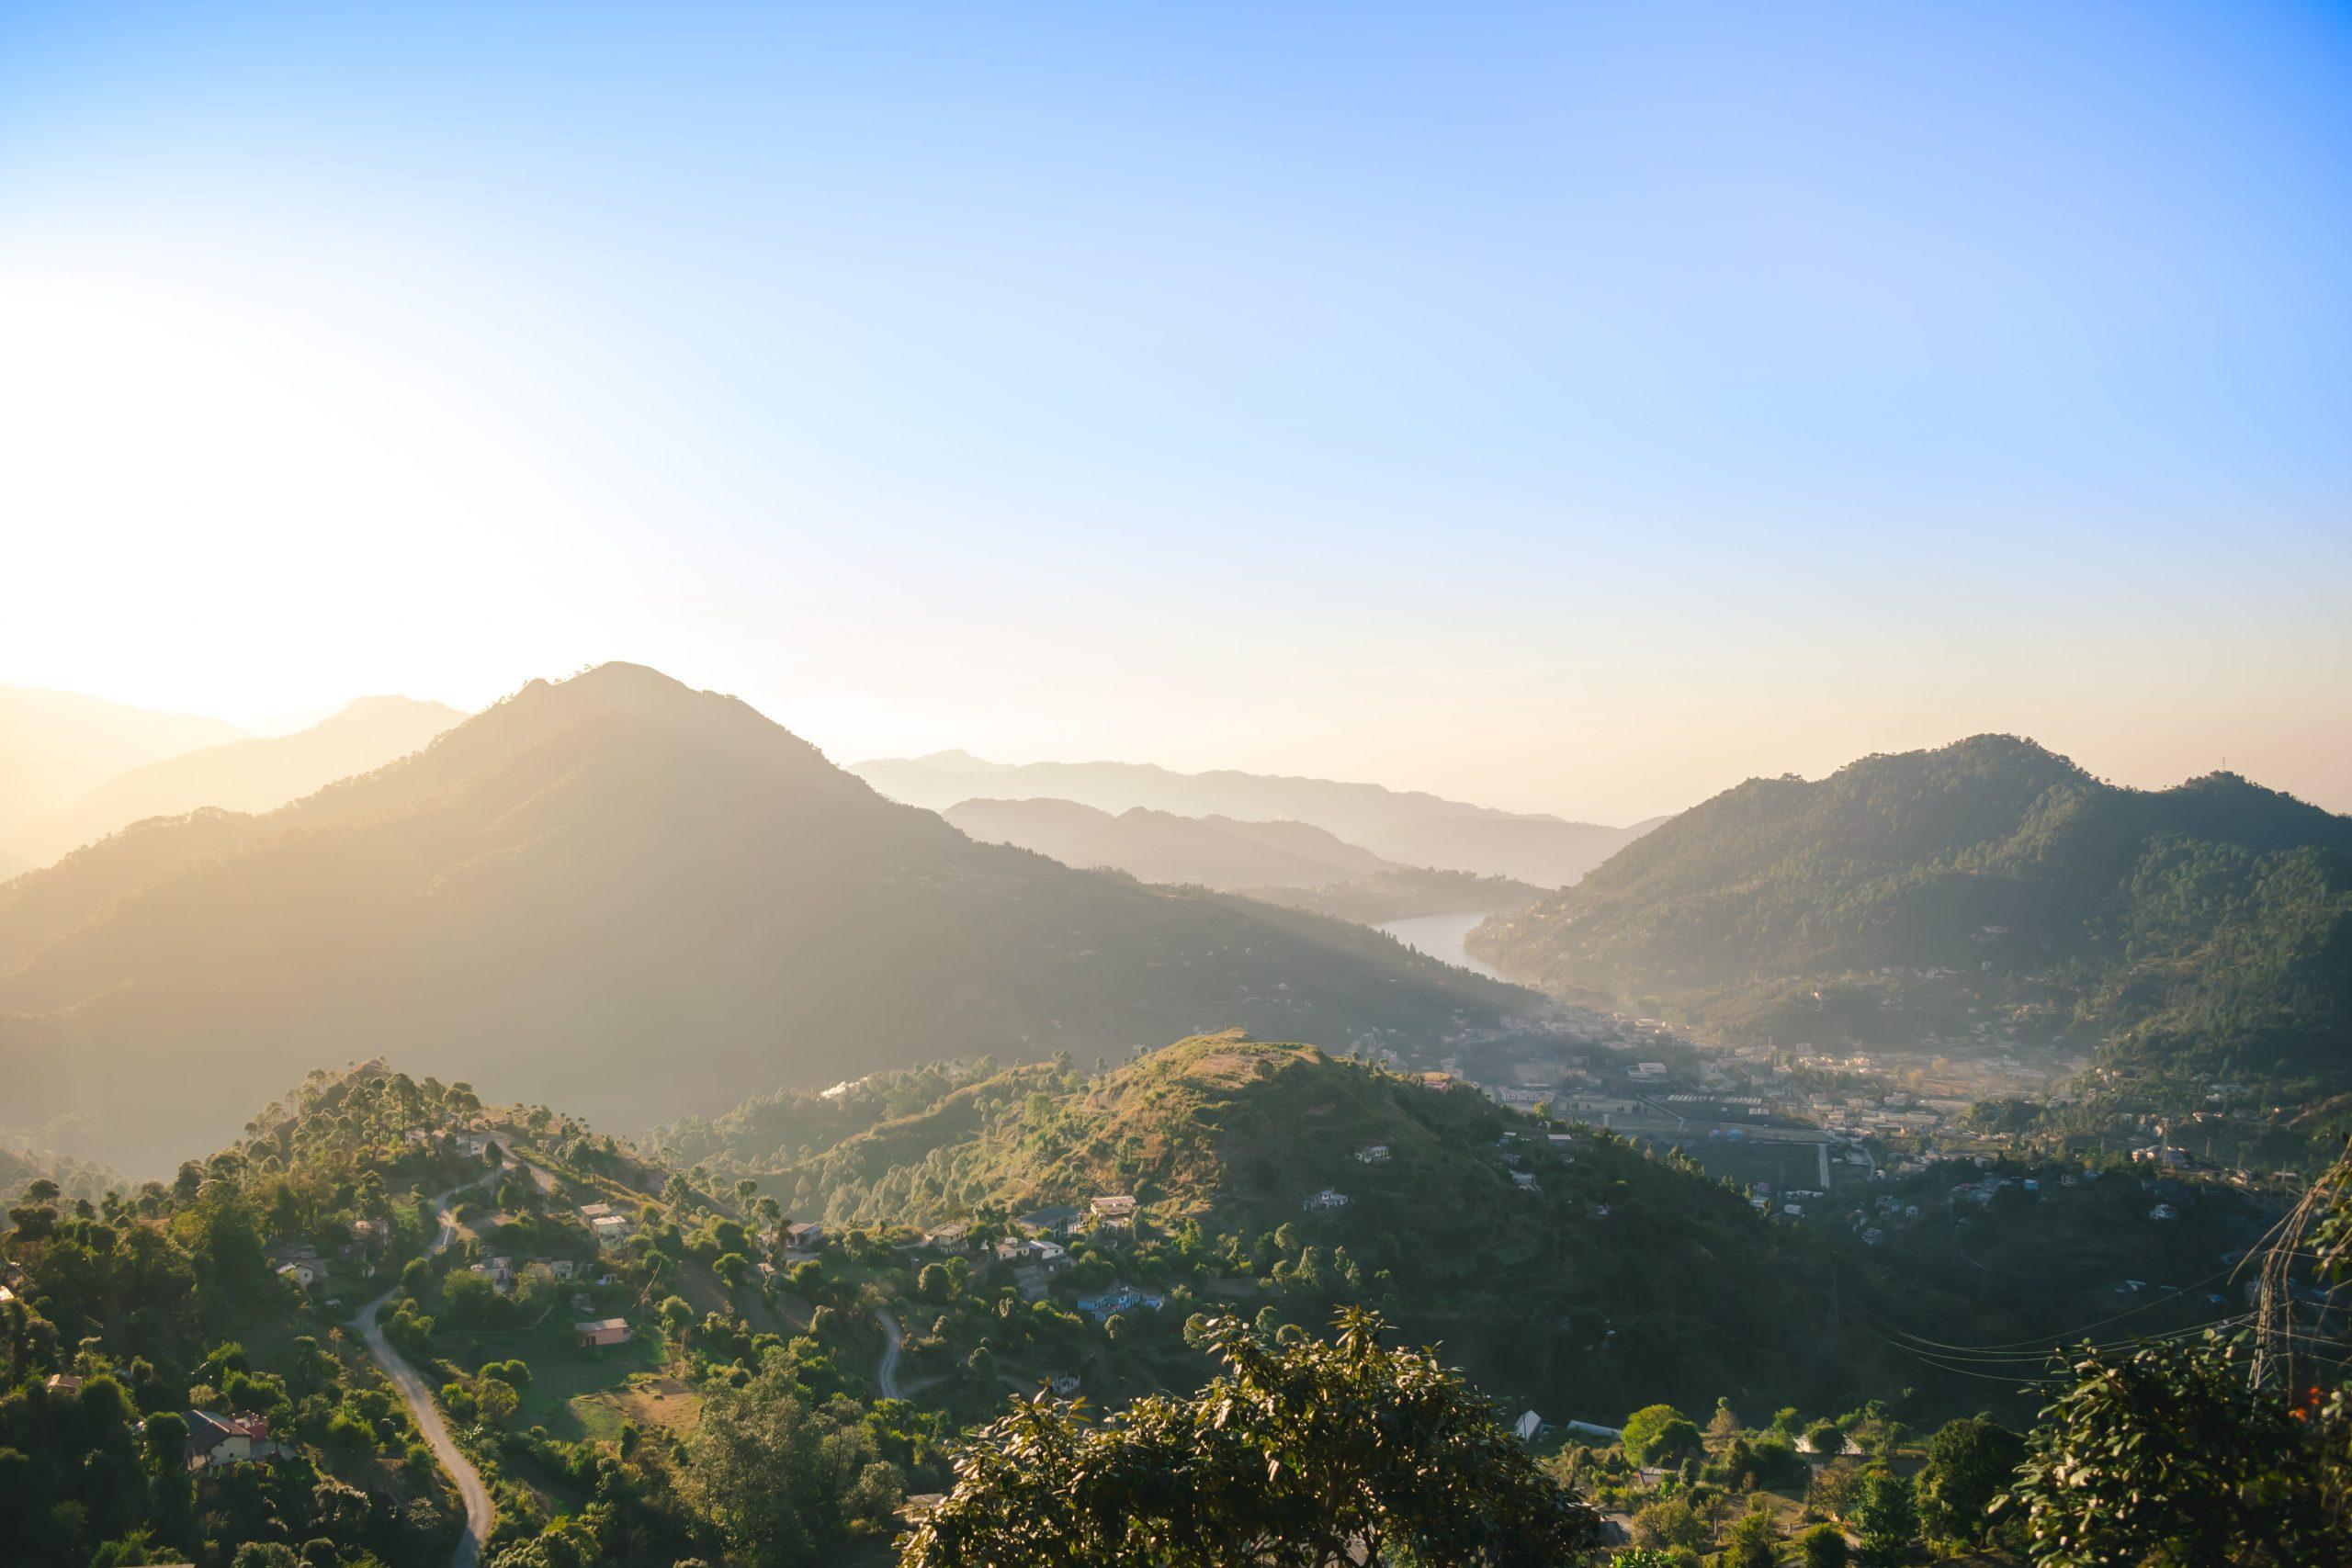 Mountain View in Uttarakhand